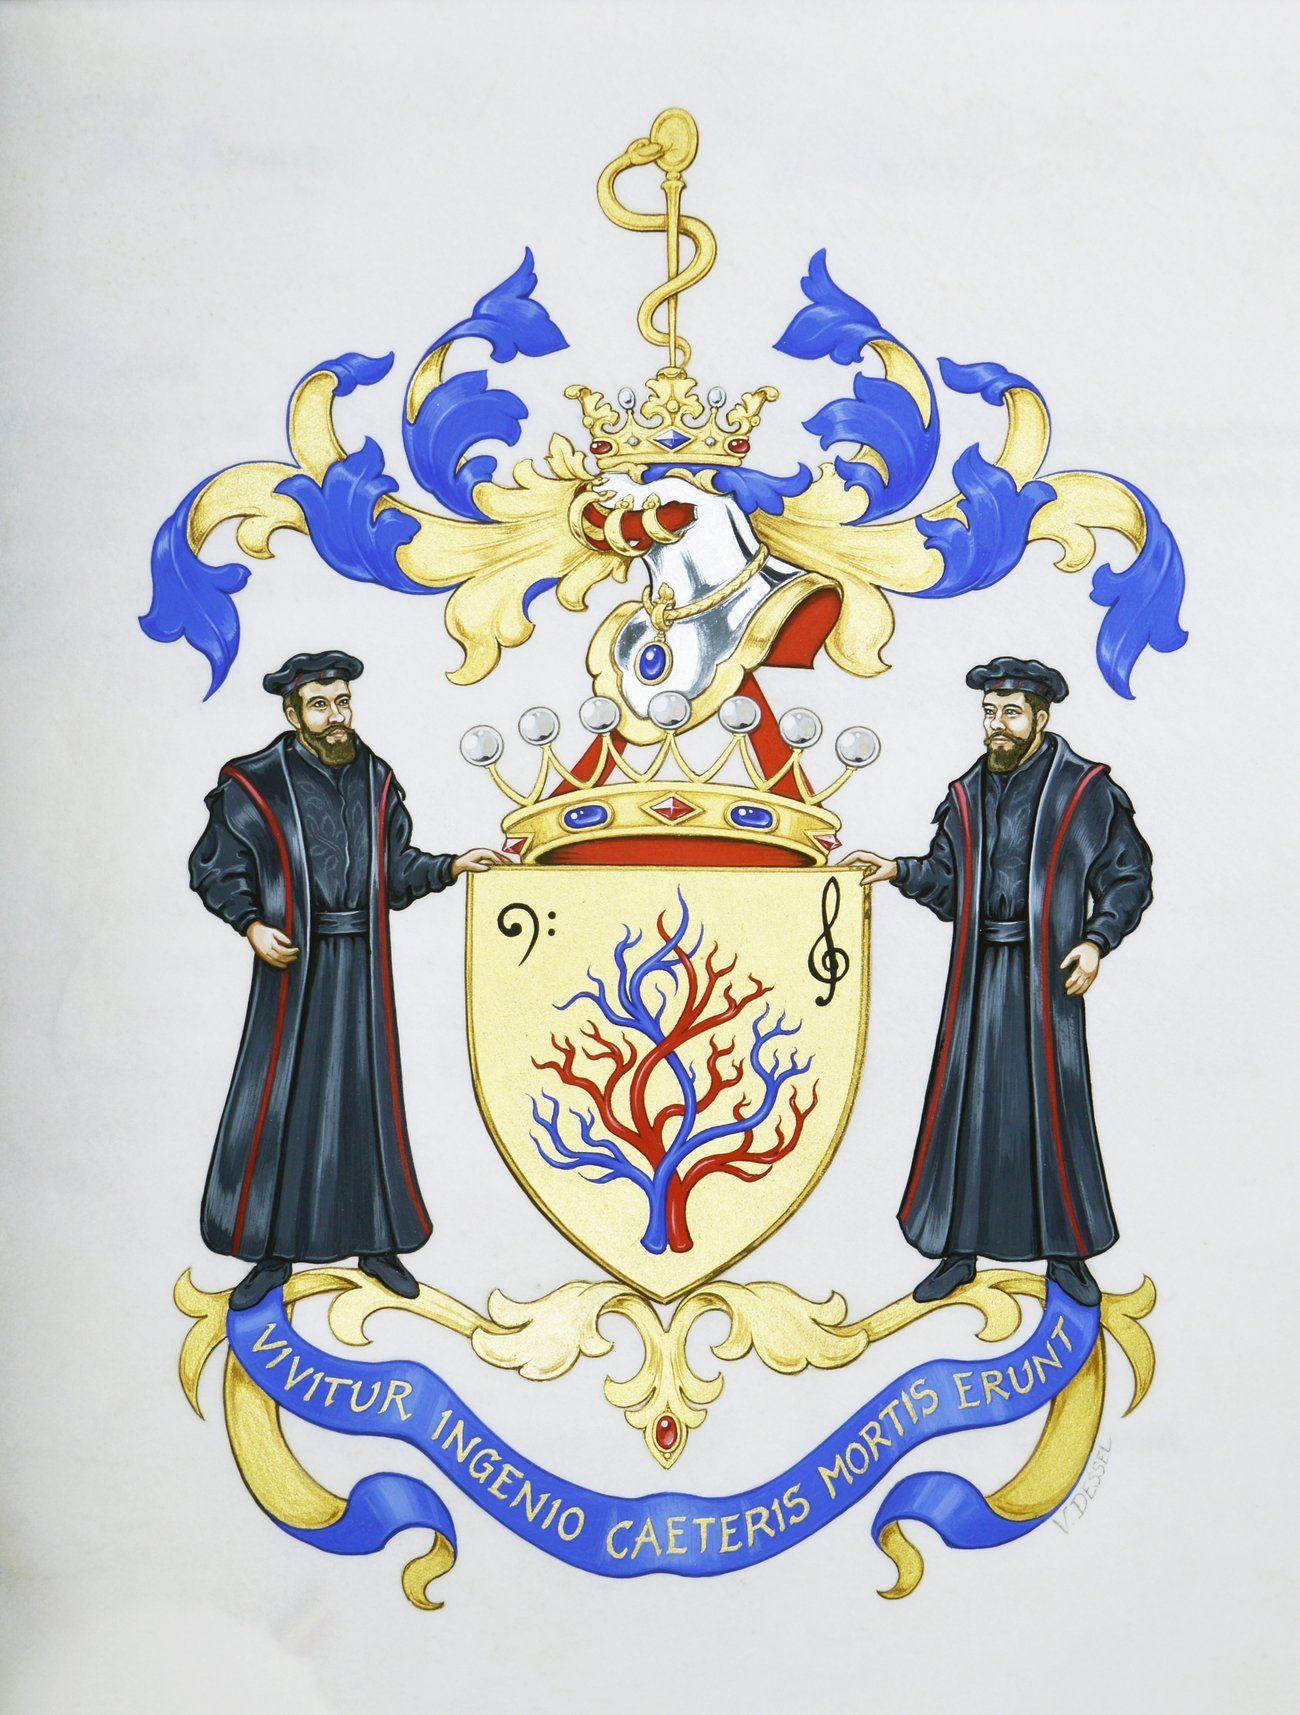 Pin by Bruce Lockett on My Heraldry Heraldry, Coat of